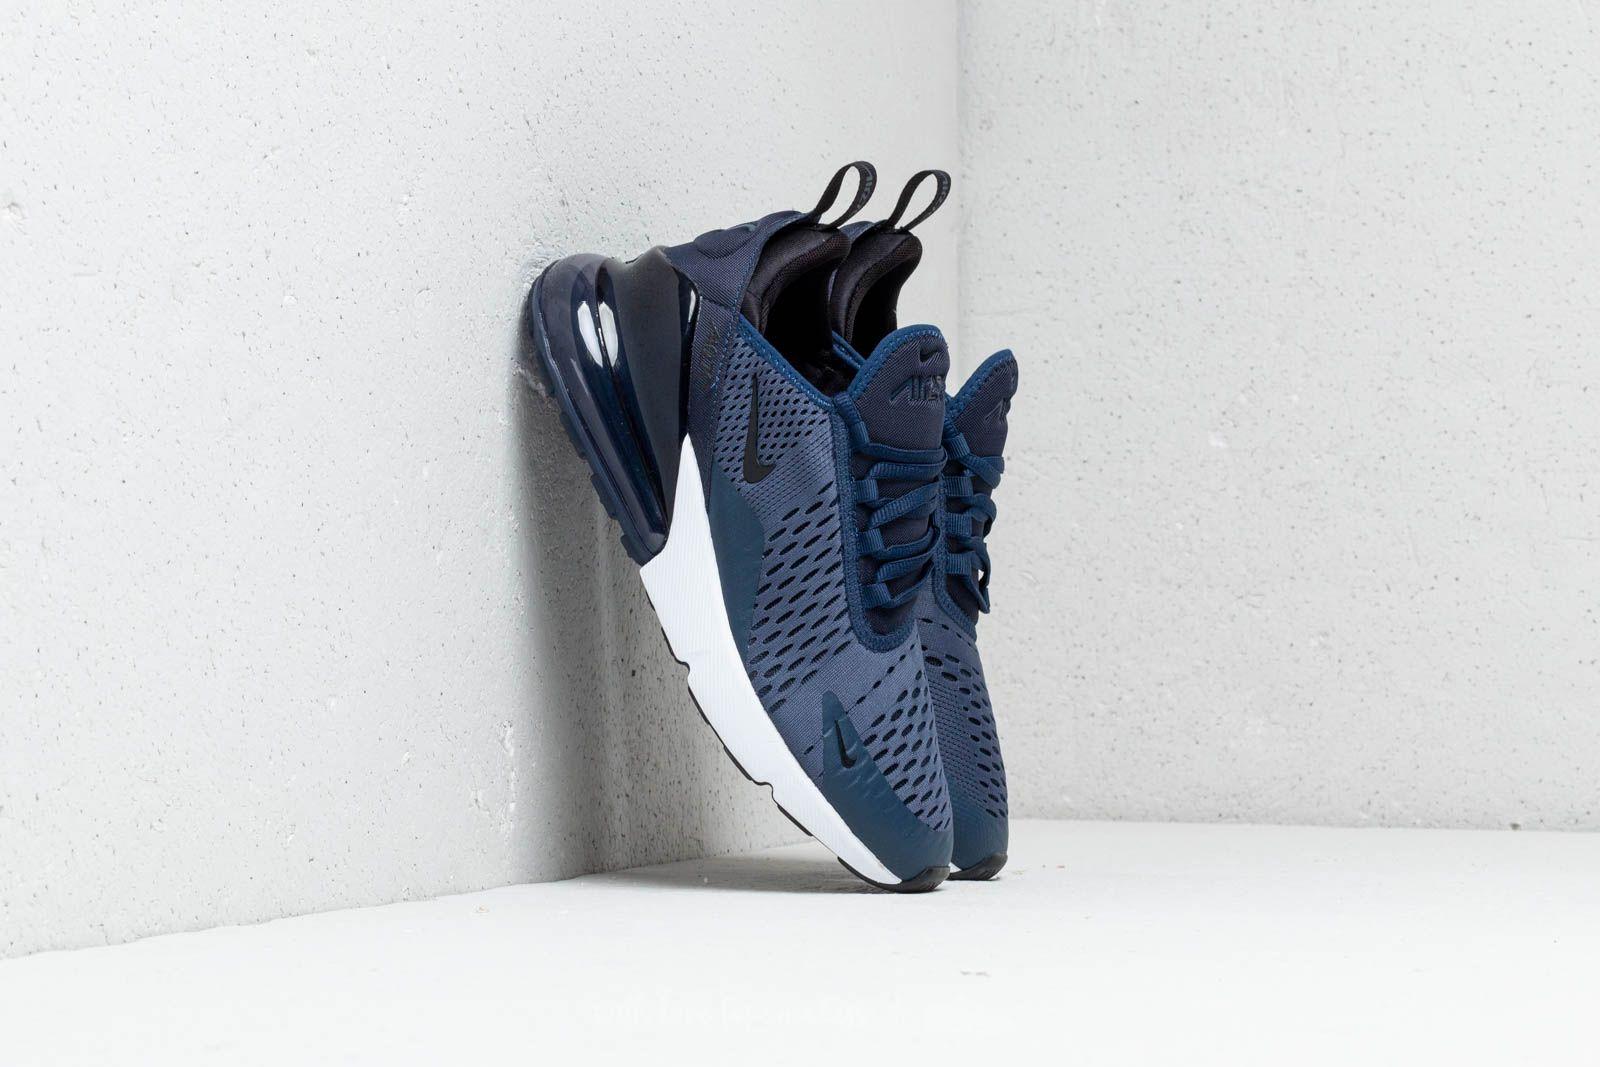 Nike Air Max 270 (GS) Midnight Navy Black White | Footshop